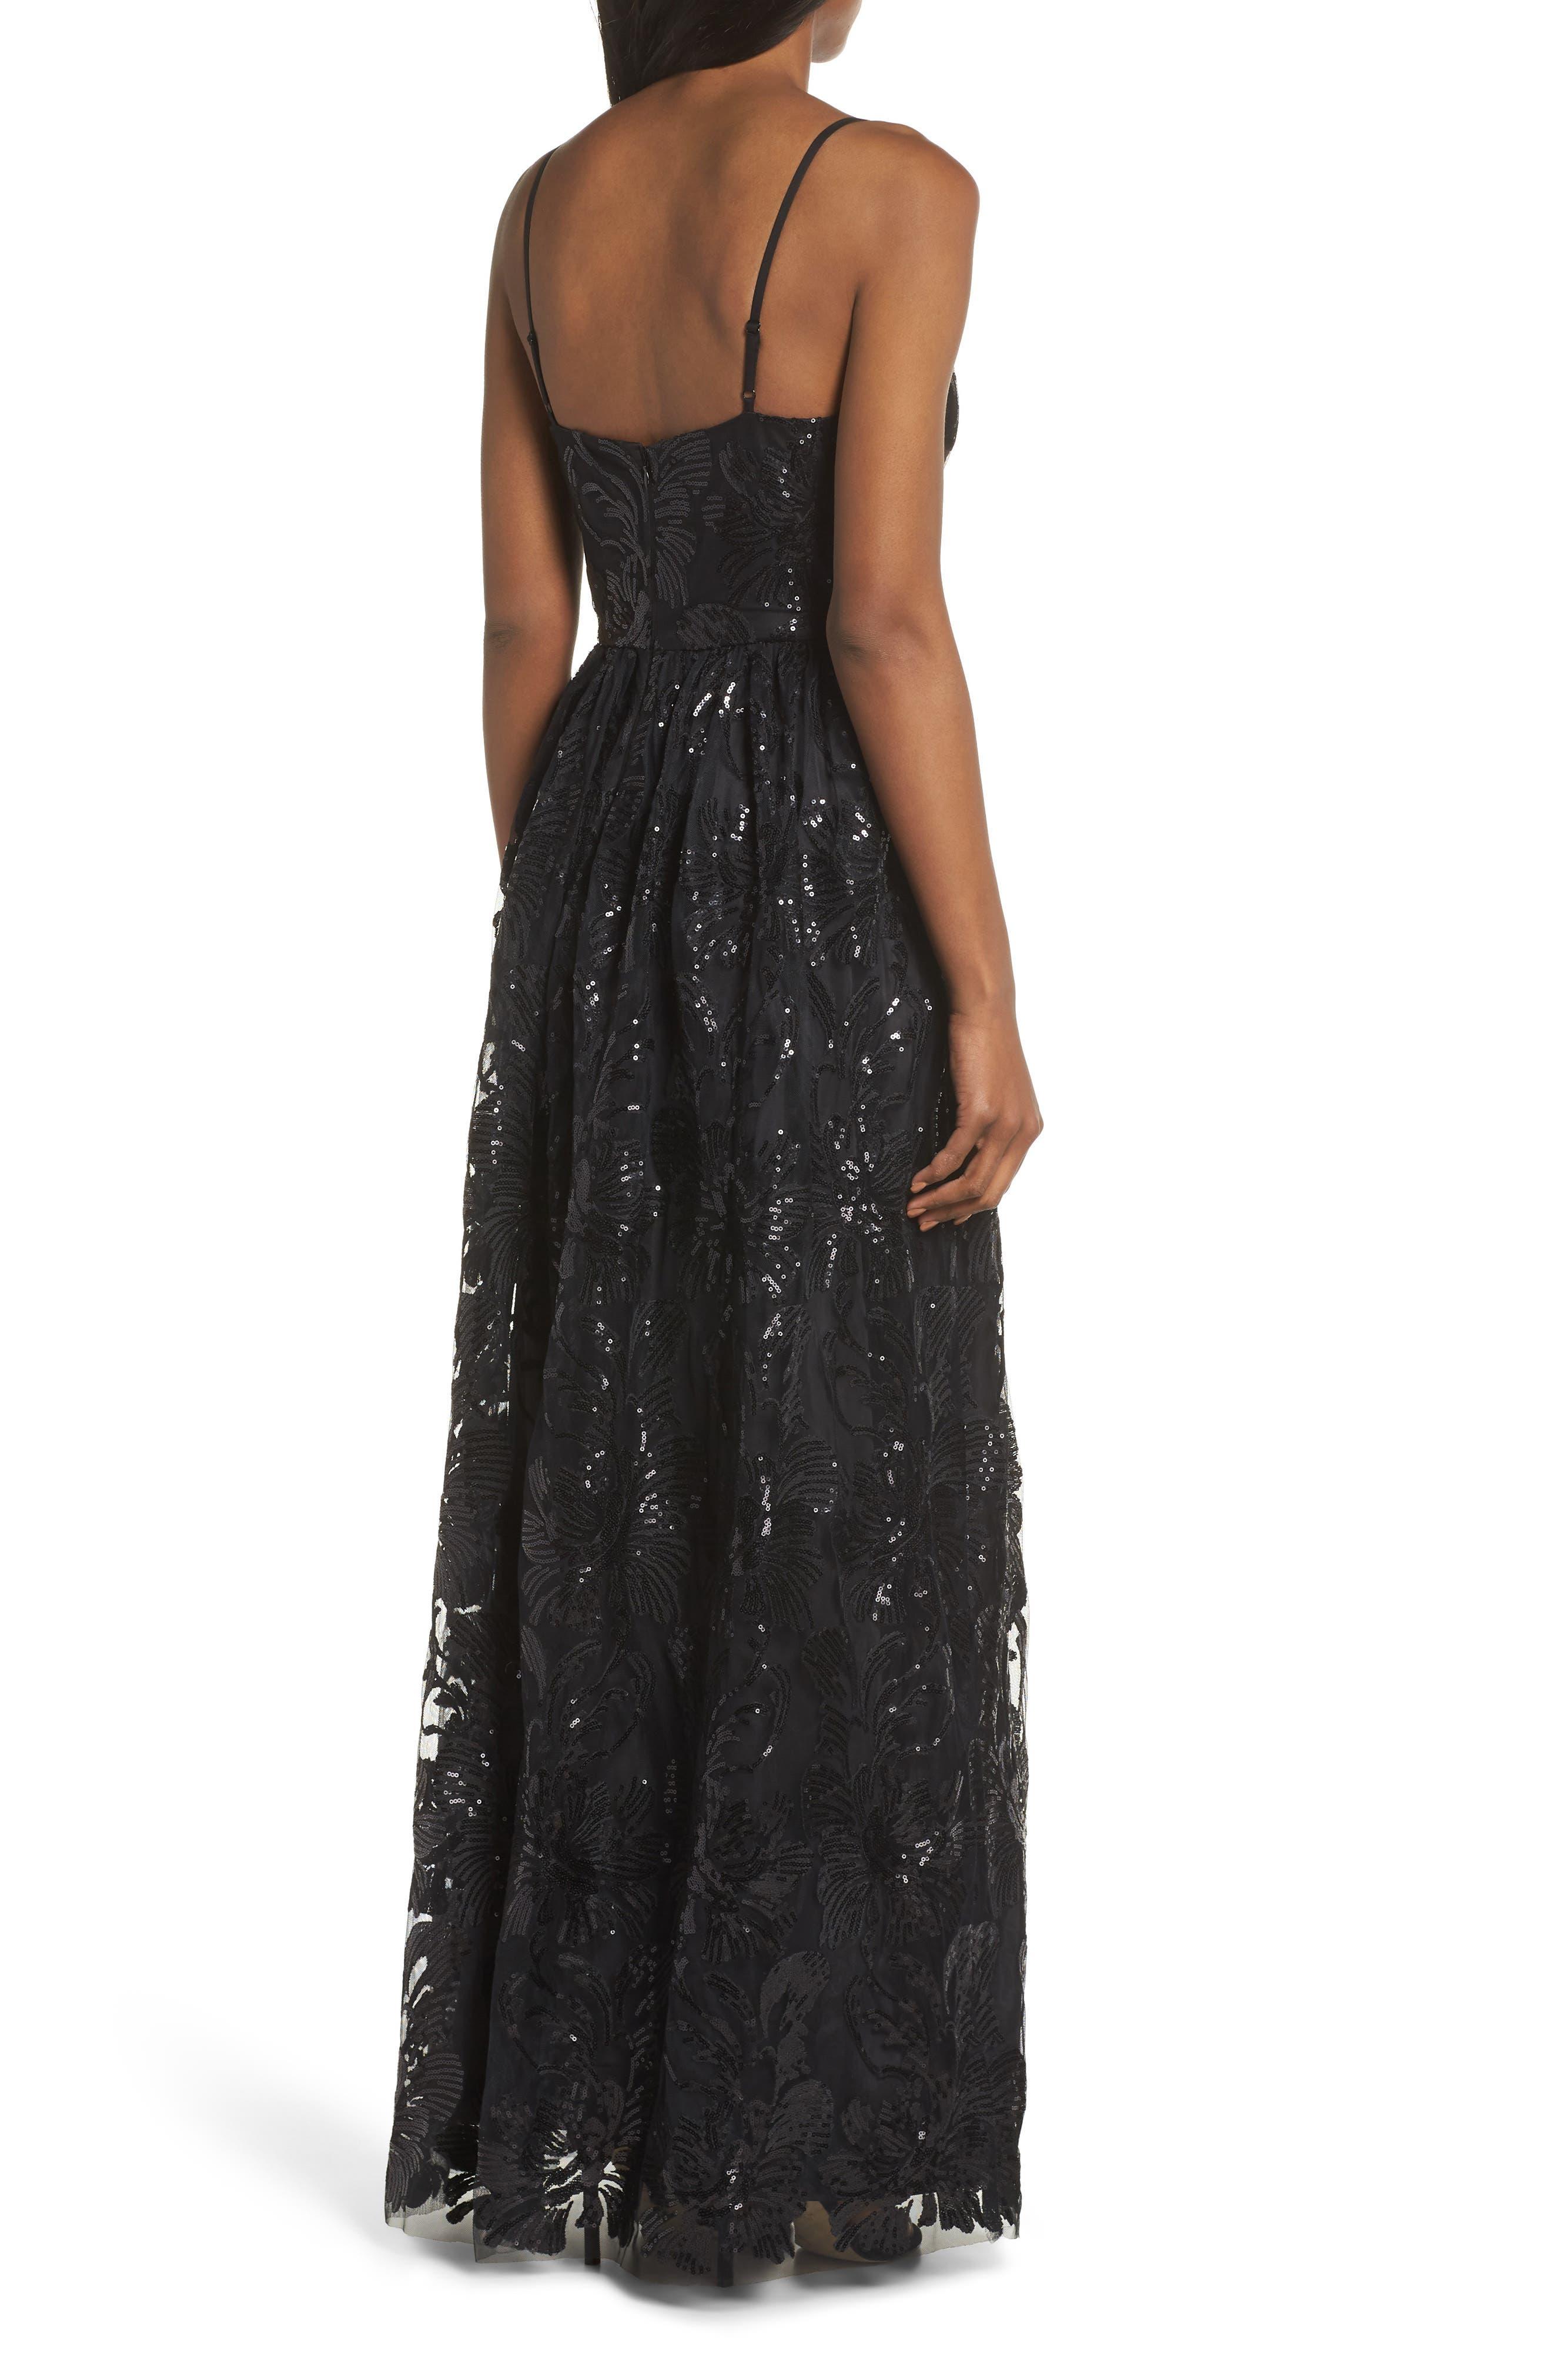 ELIZA J, Sequin Embroidered Mesh Evening Dress, Alternate thumbnail 2, color, BLACK